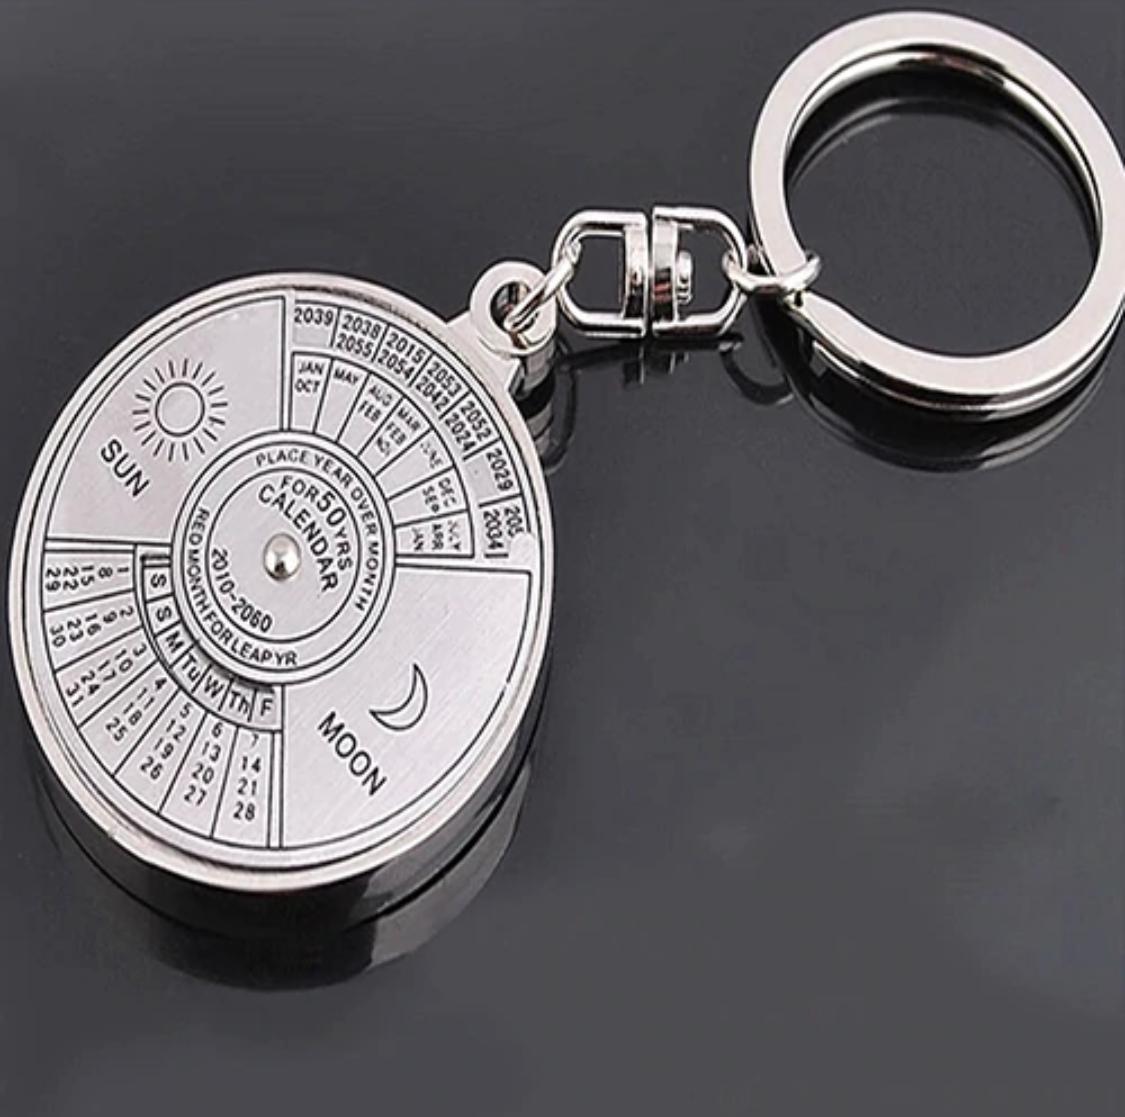 50 Years Perpetual Calendar Key Chain Silver Alloy